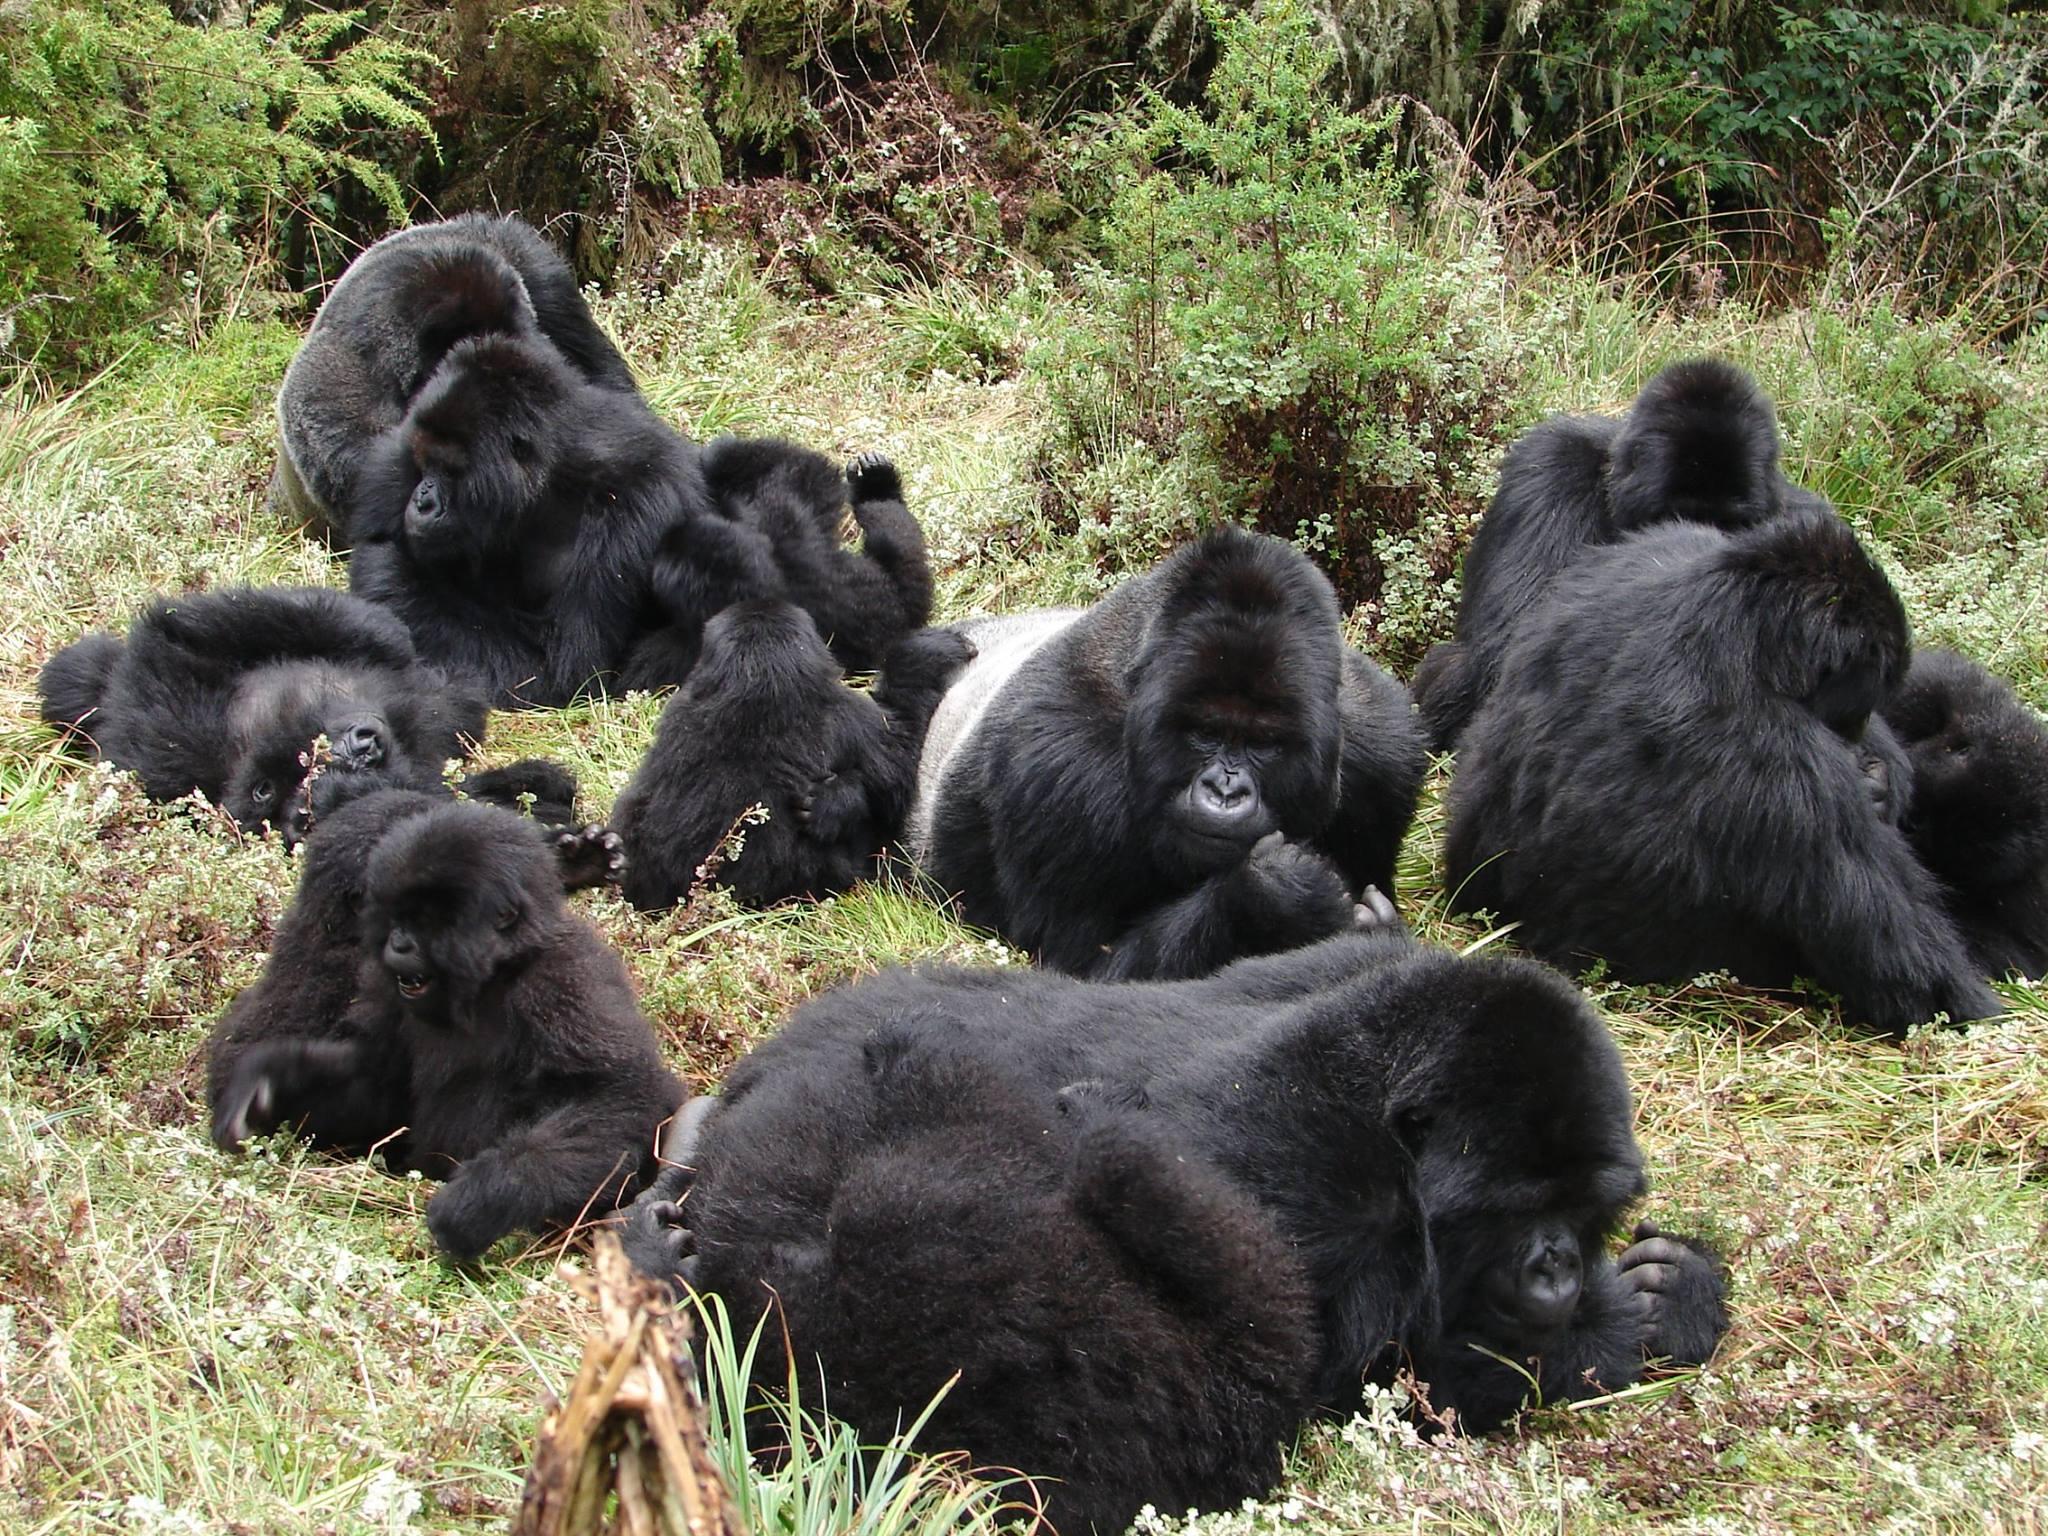 New wildlife film calls for action to protect Rwandan gorilla